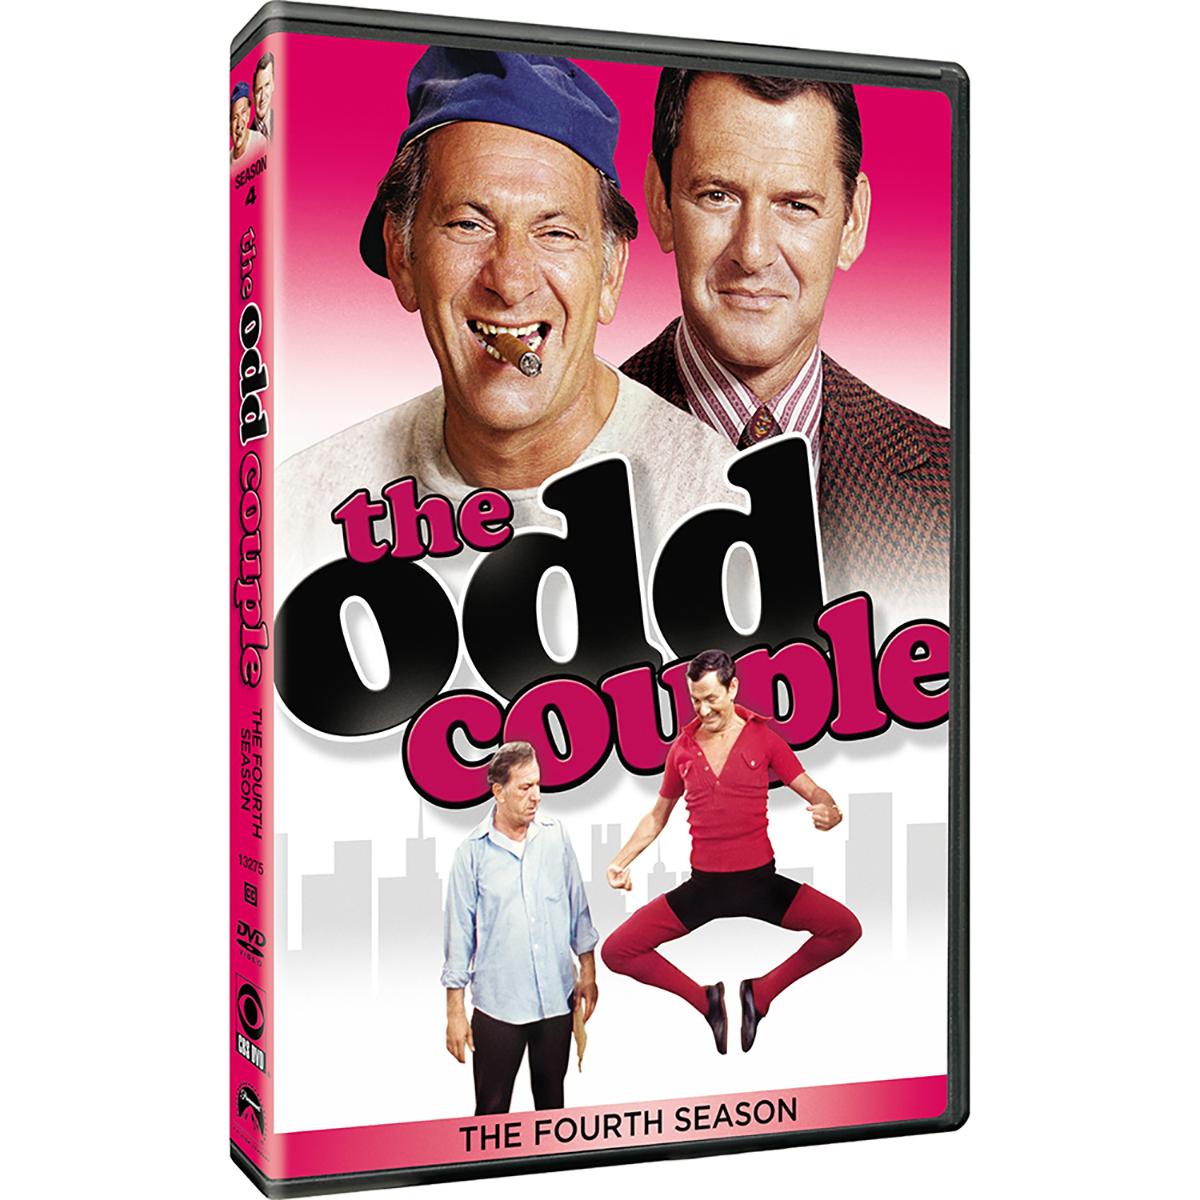 The Odd Couple: Season 4 DVD -  DVDs & Videos 6445-319422